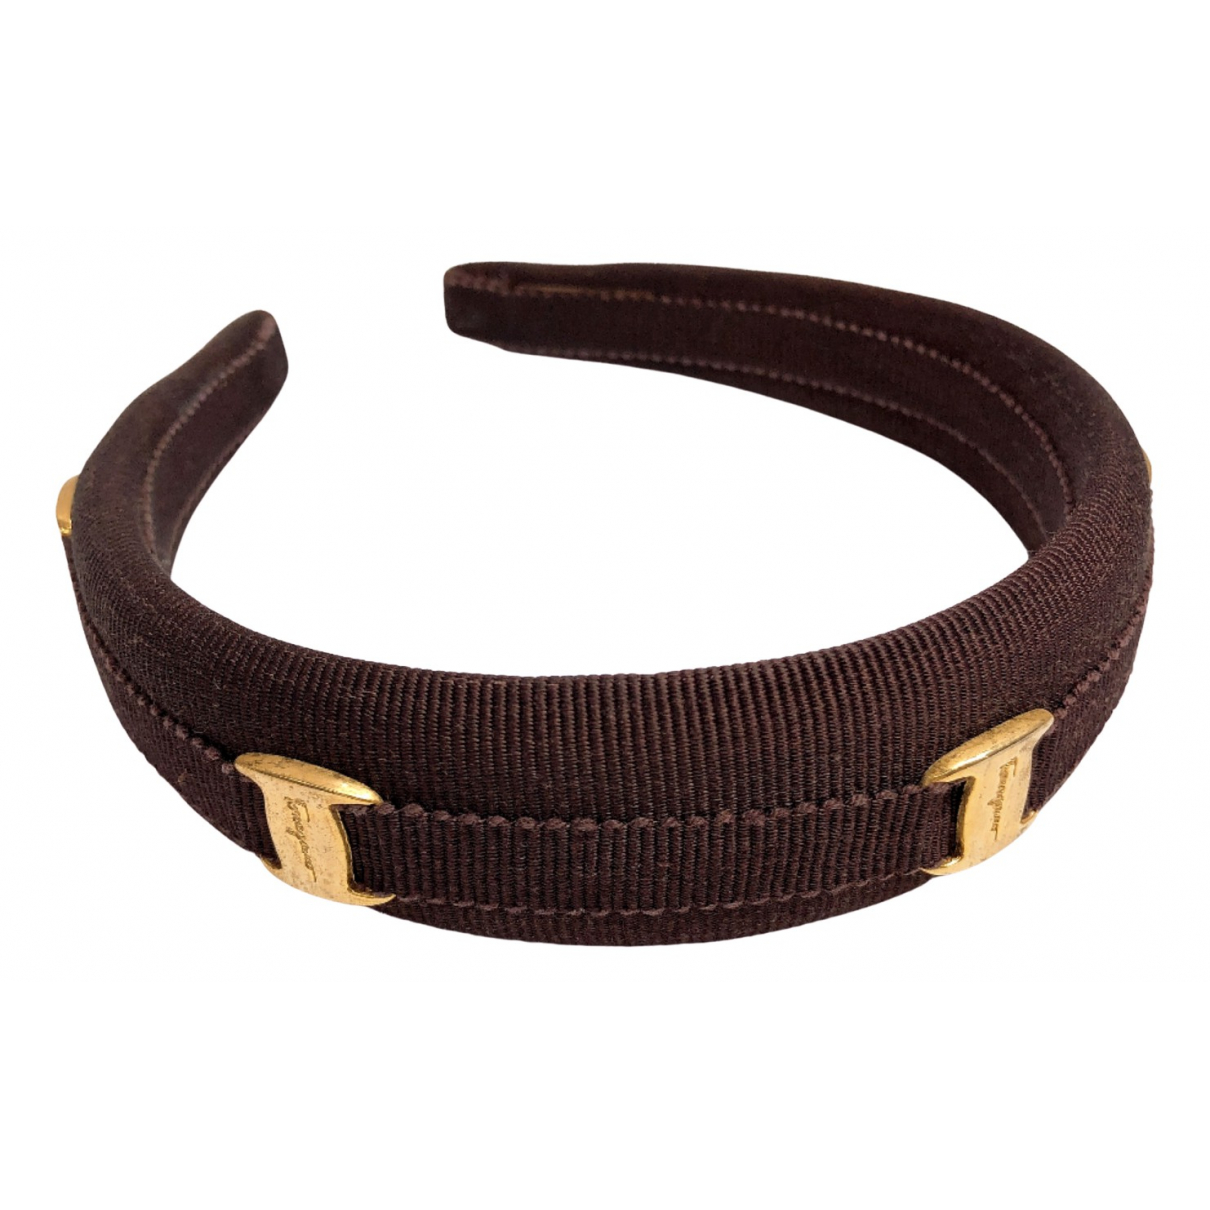 Salvatore Ferragamo N Gold Hair accessories for Women N